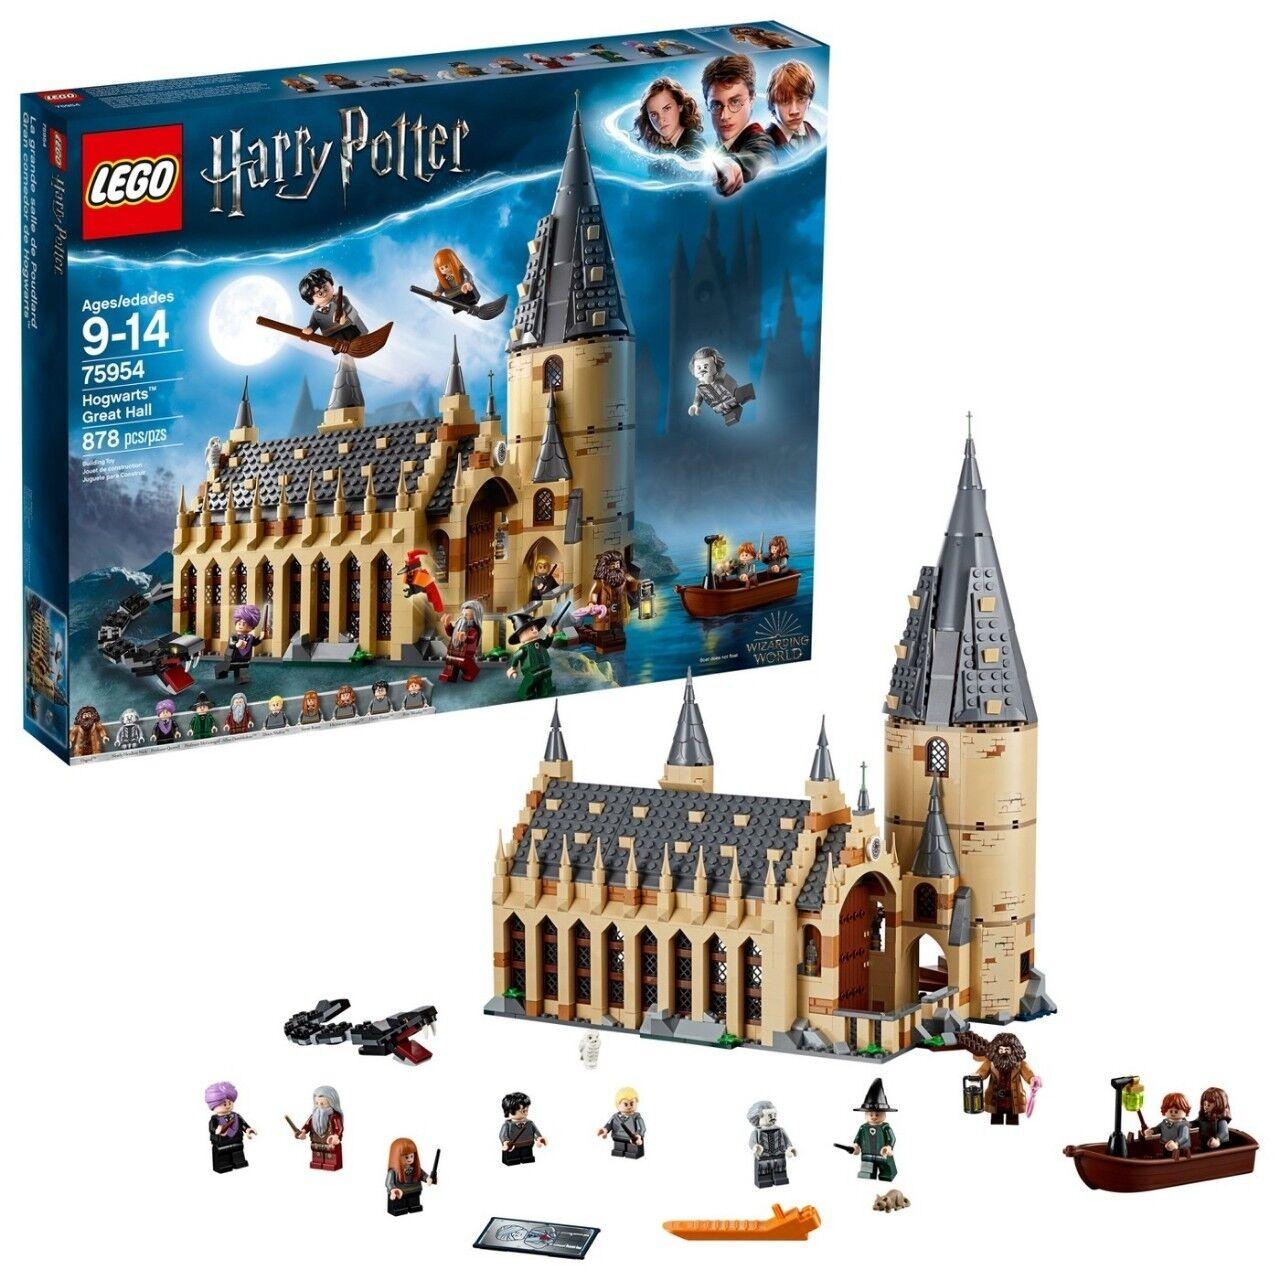 Lego Harry Potter Poudlard Great Hall  75954 Building Toy 878 PIECES